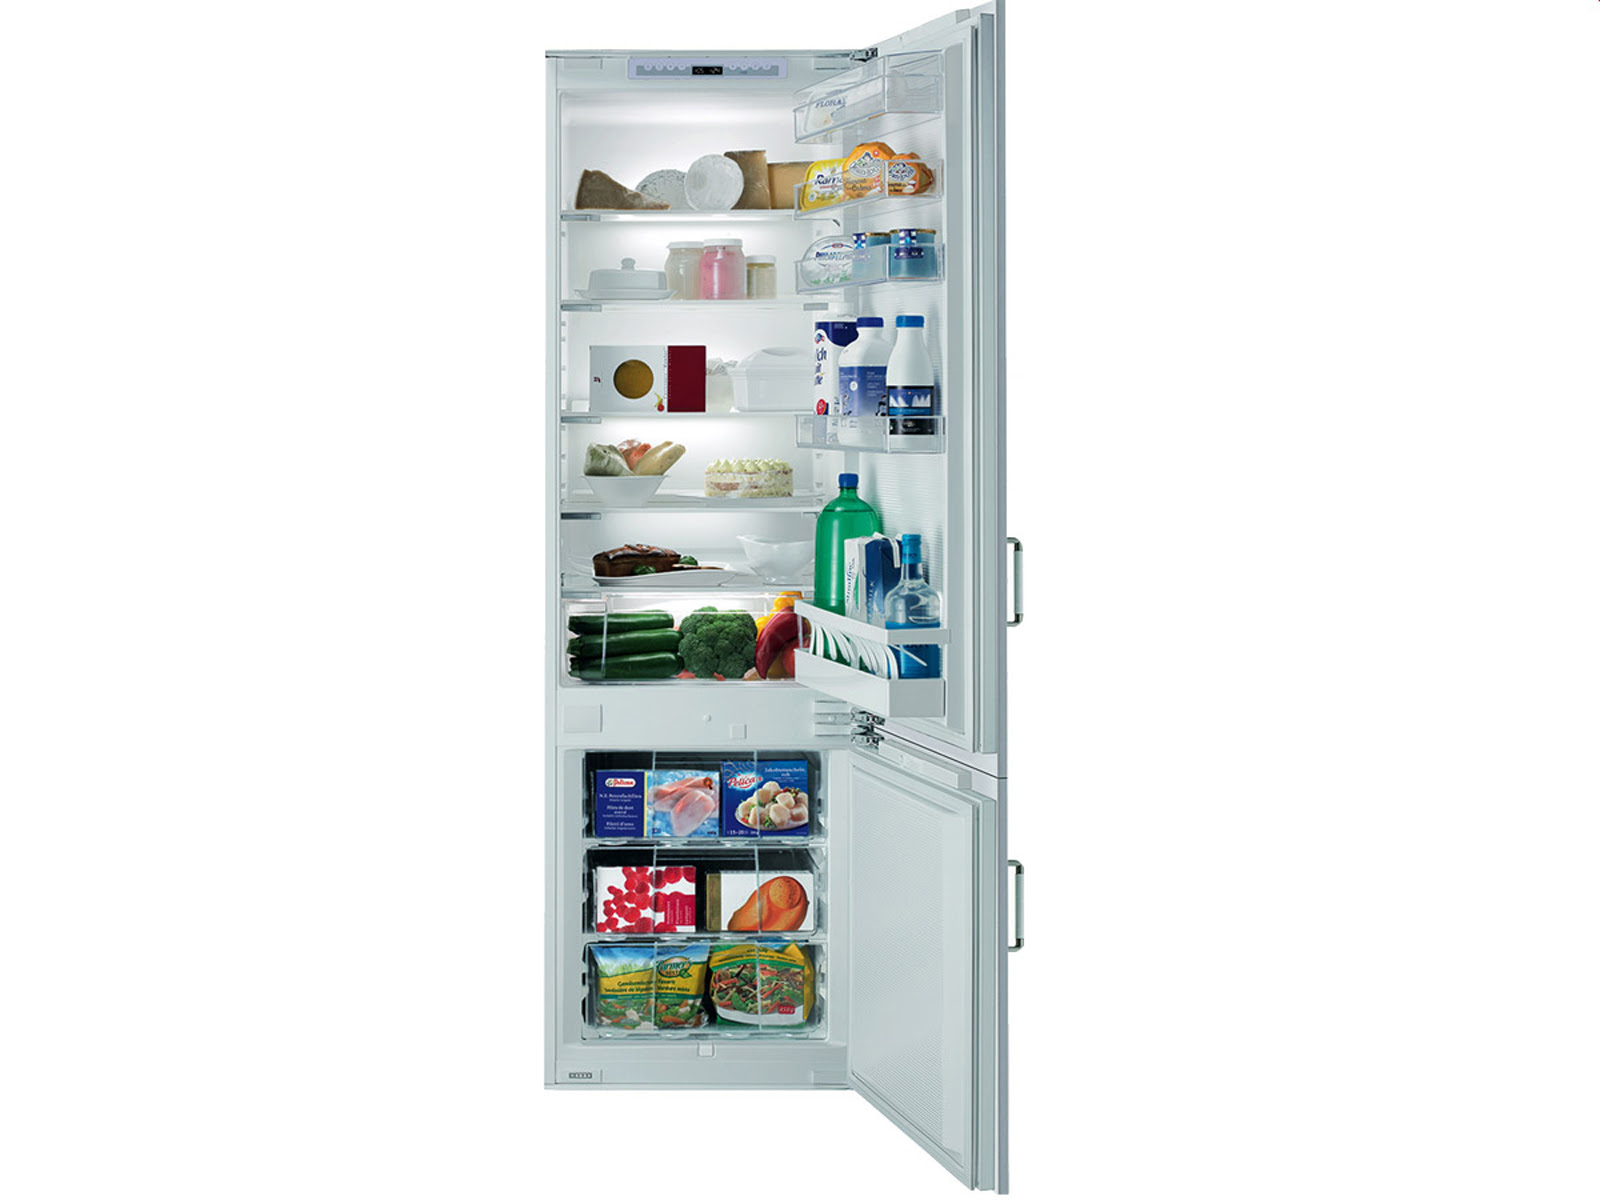 Red Bull Mini Kühlschrank Bedienungsanleitung : Ggg bedienungsanleitung kühlschrank marcella fischer